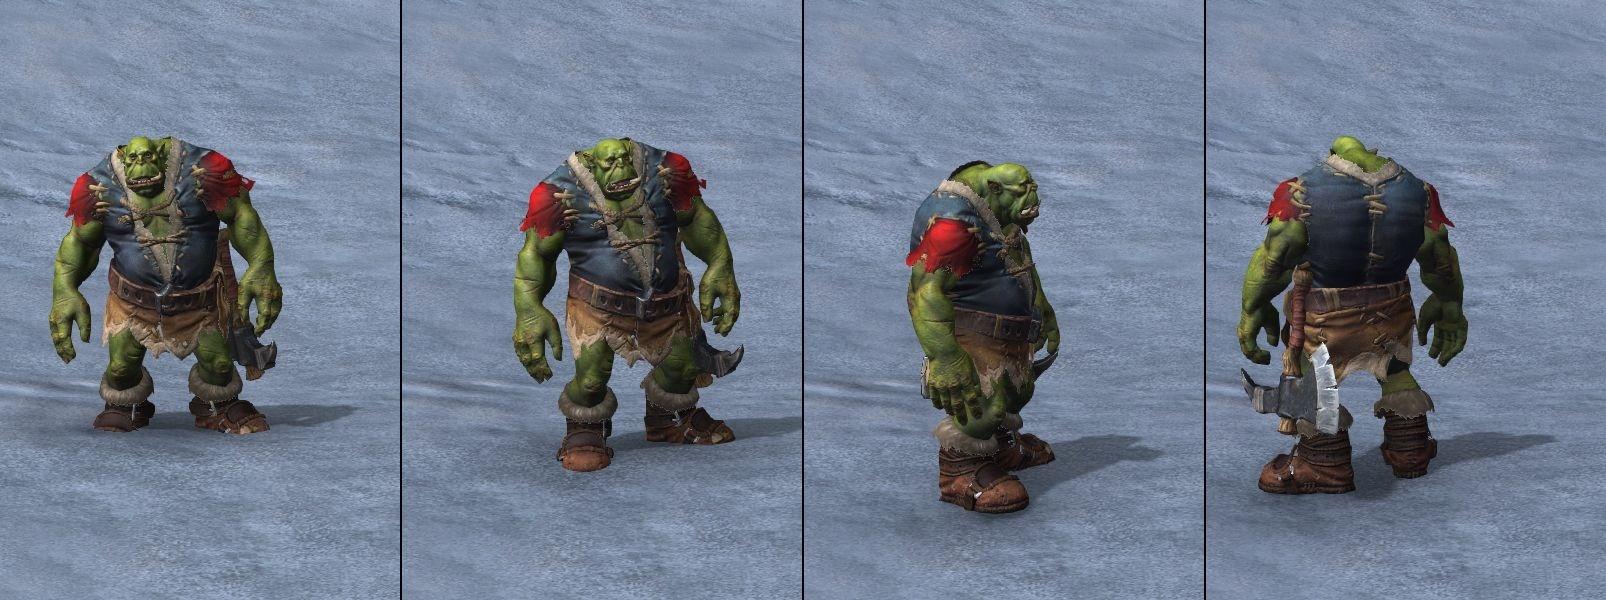 Warcraft III Reforged : Peon